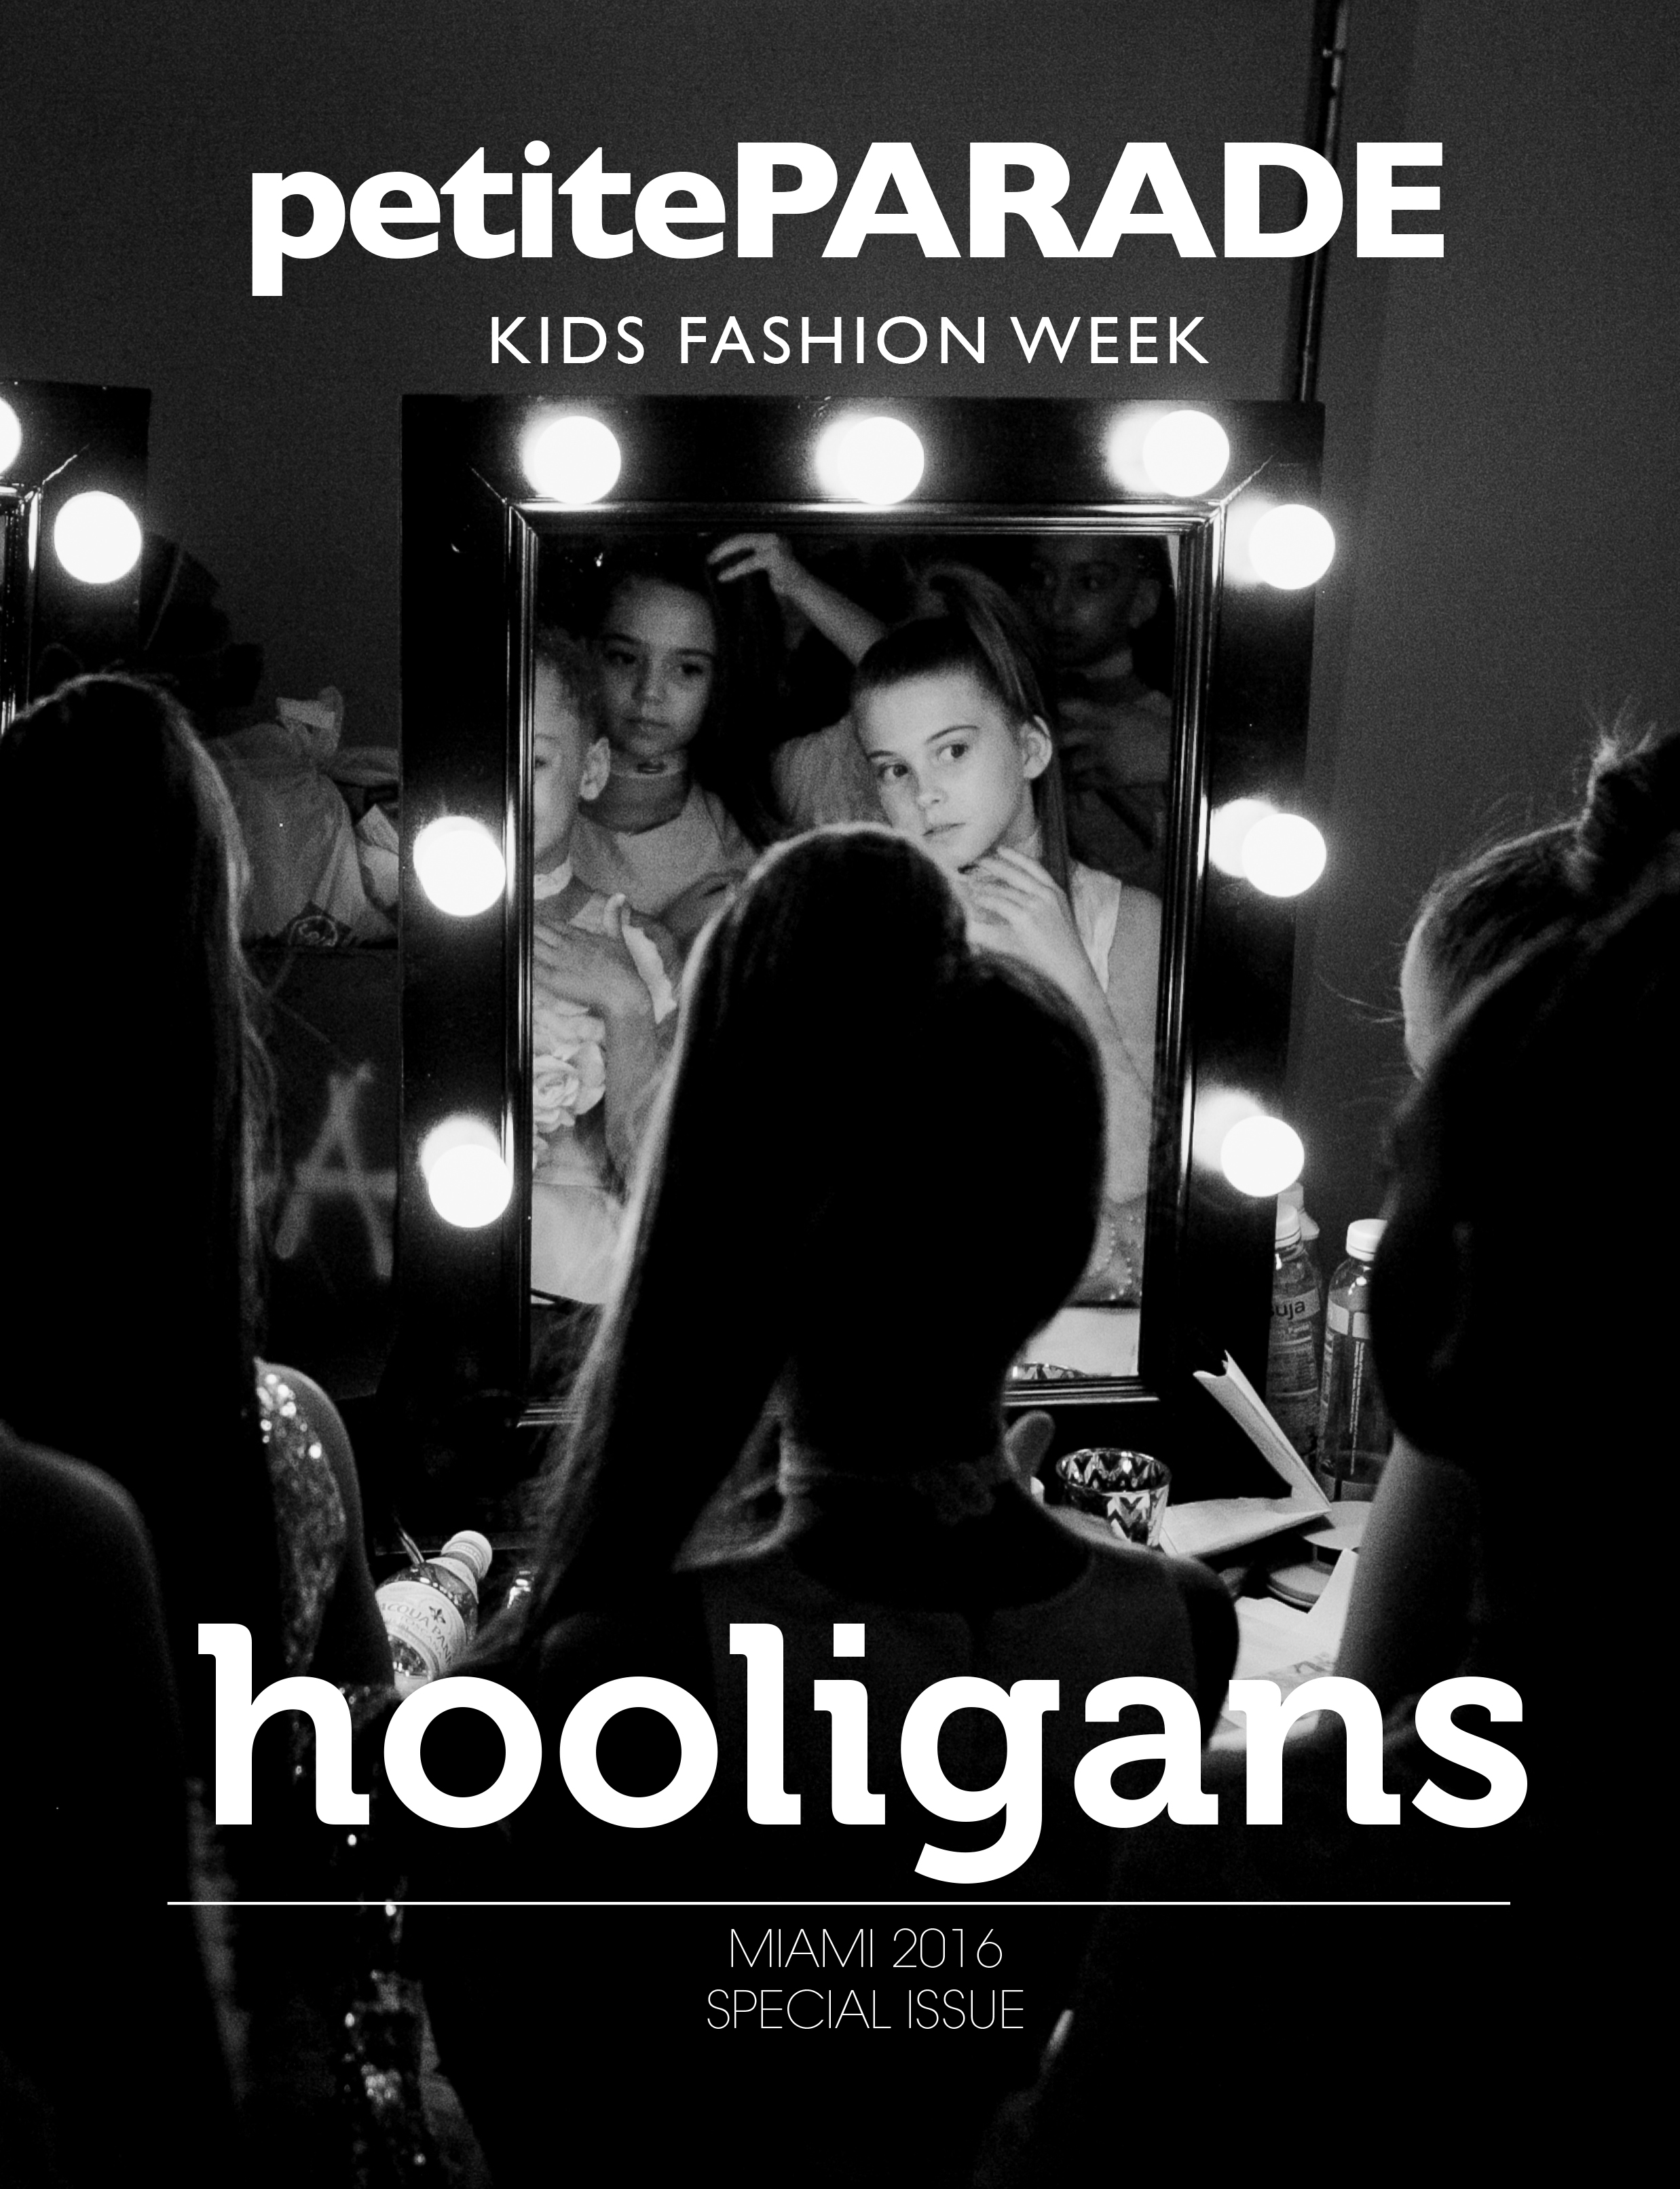 Hooligans_PetiteParade_Special_Miami16_Cover.jpg